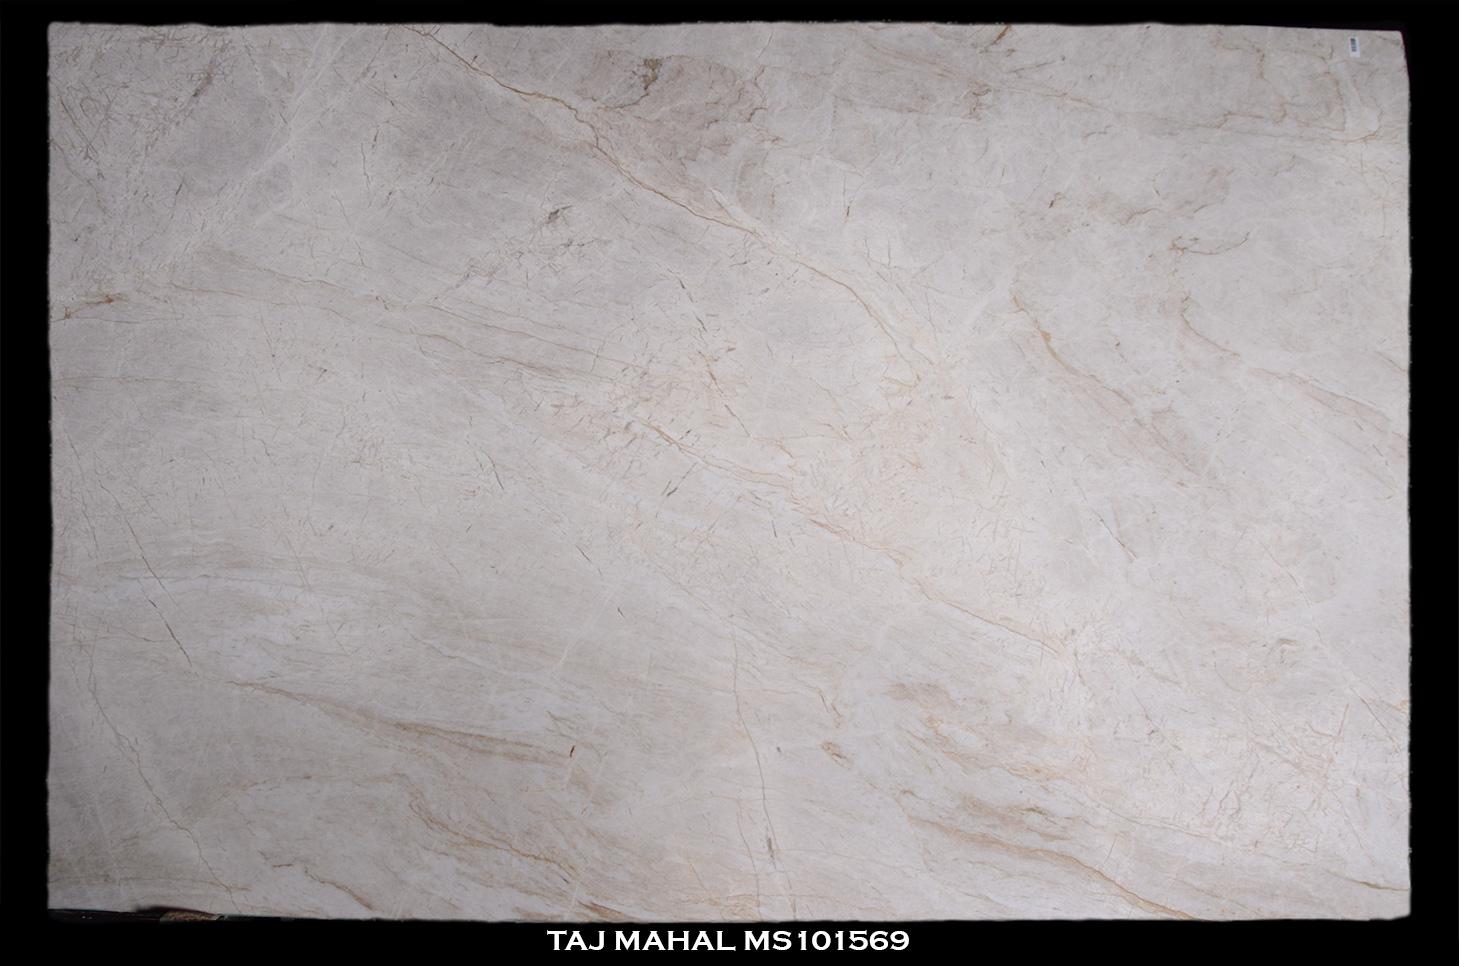 TAJ-MAHAL-MS101569-slab